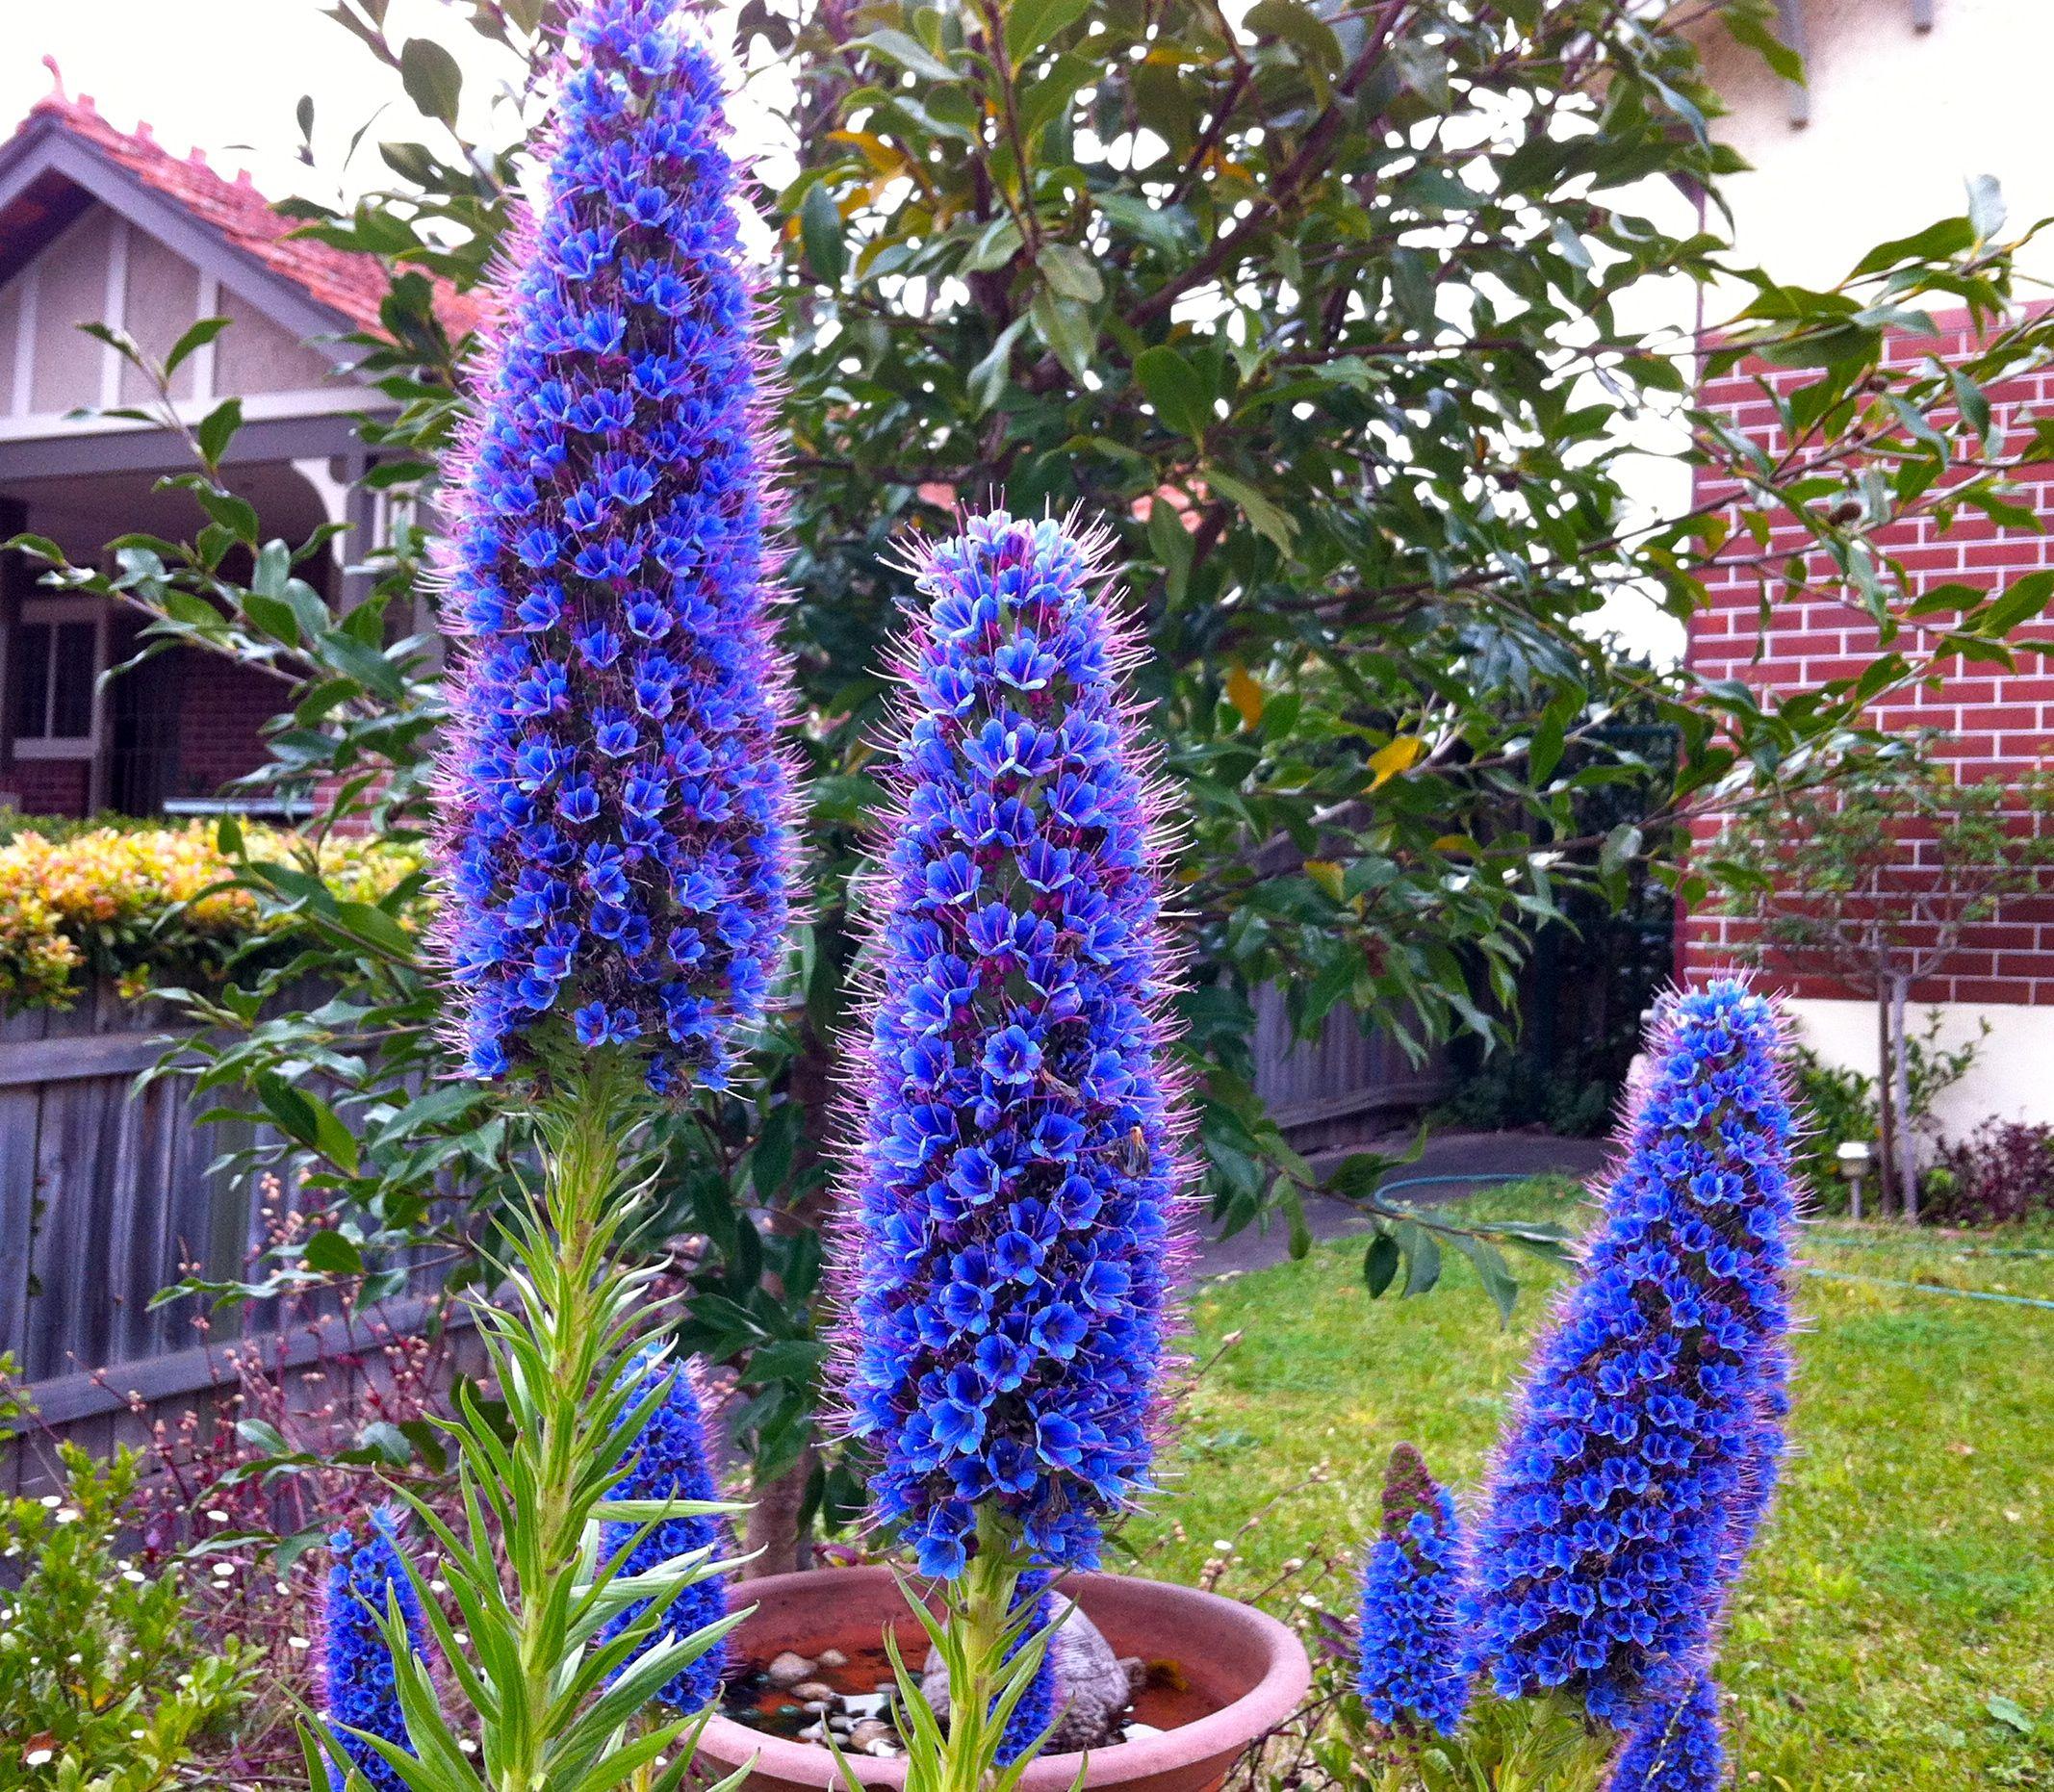 Humble flowers – a stunning Australian native called Echium